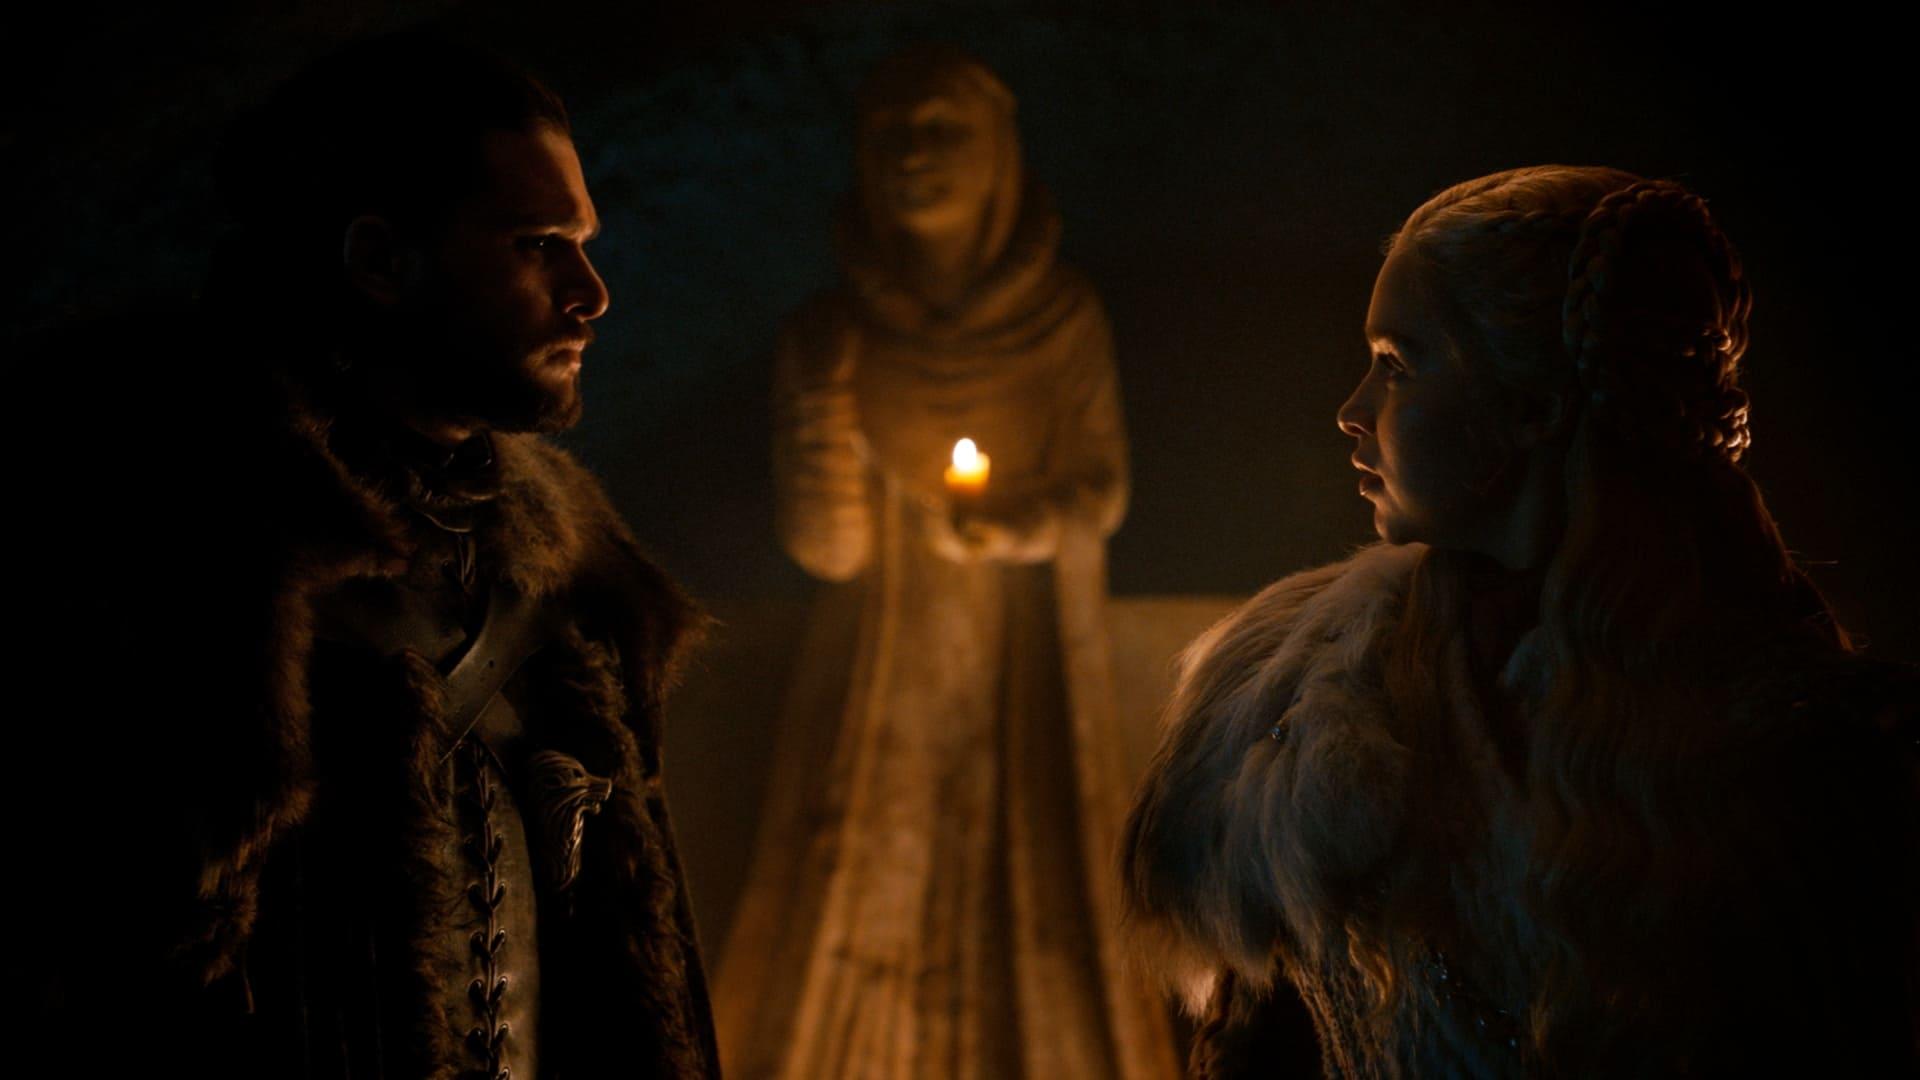 Game of Thrones - Season game Episode of